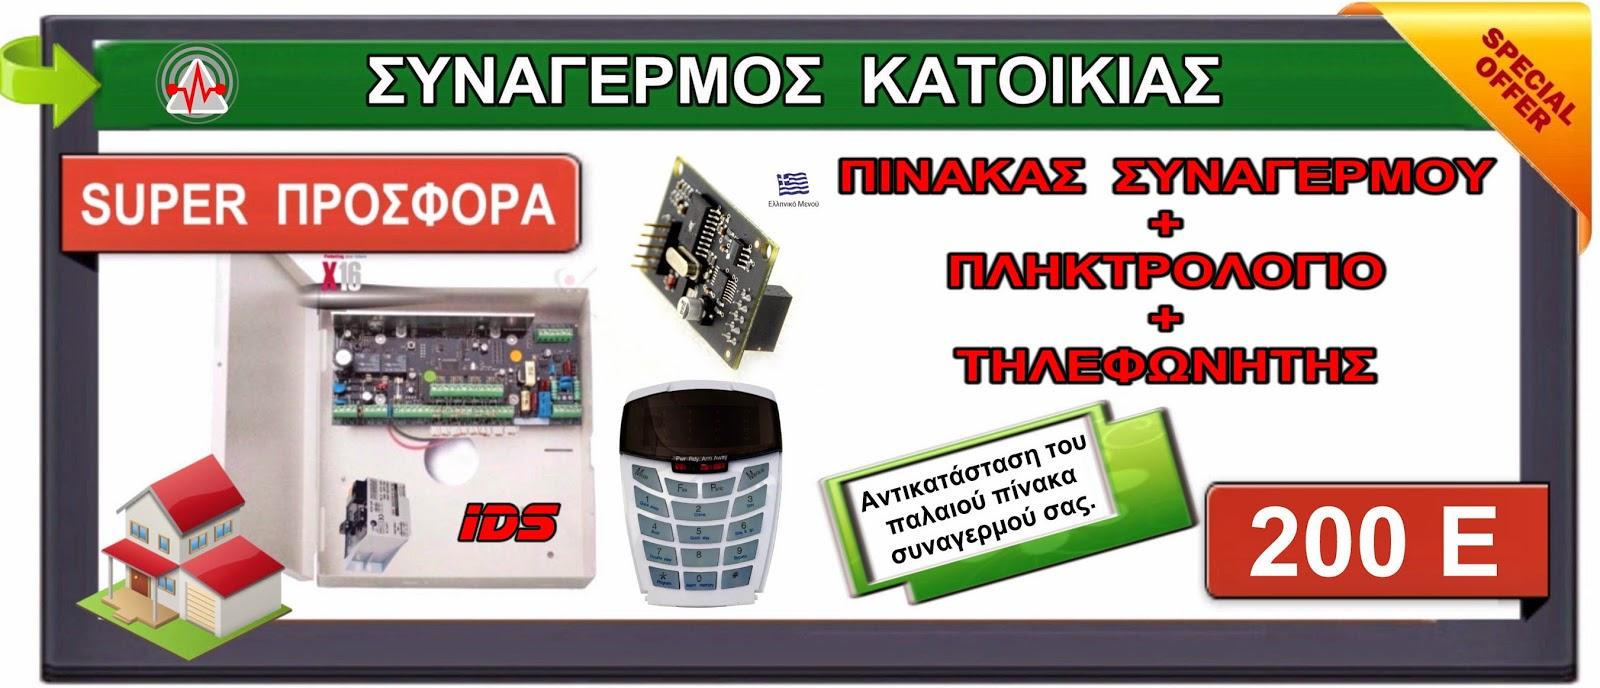 http://g4alarm.blogspot.gr/2014/05/ids-1.html#.U_iyEqOPaWg